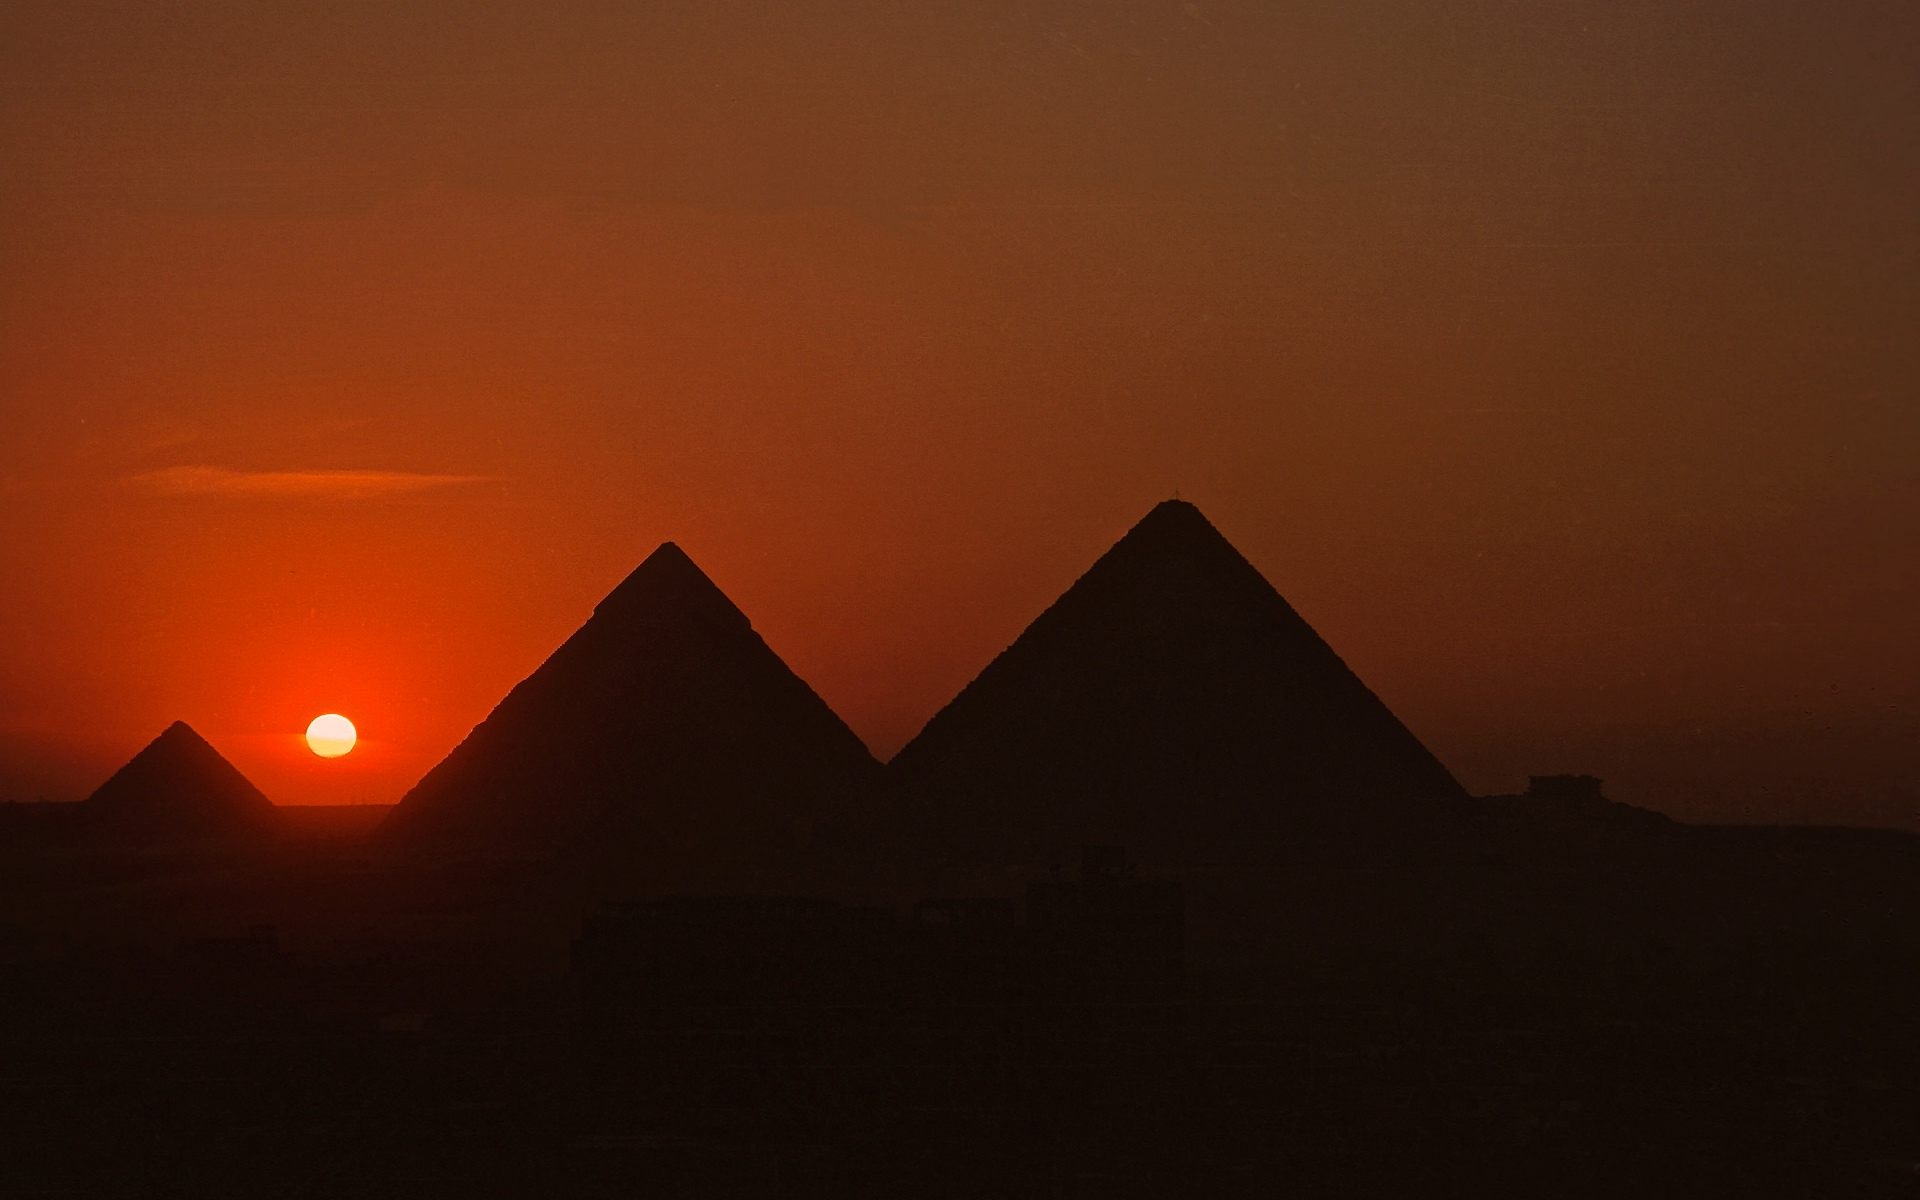 The Pyramids of Giza at dusk -Giza, Egypt.